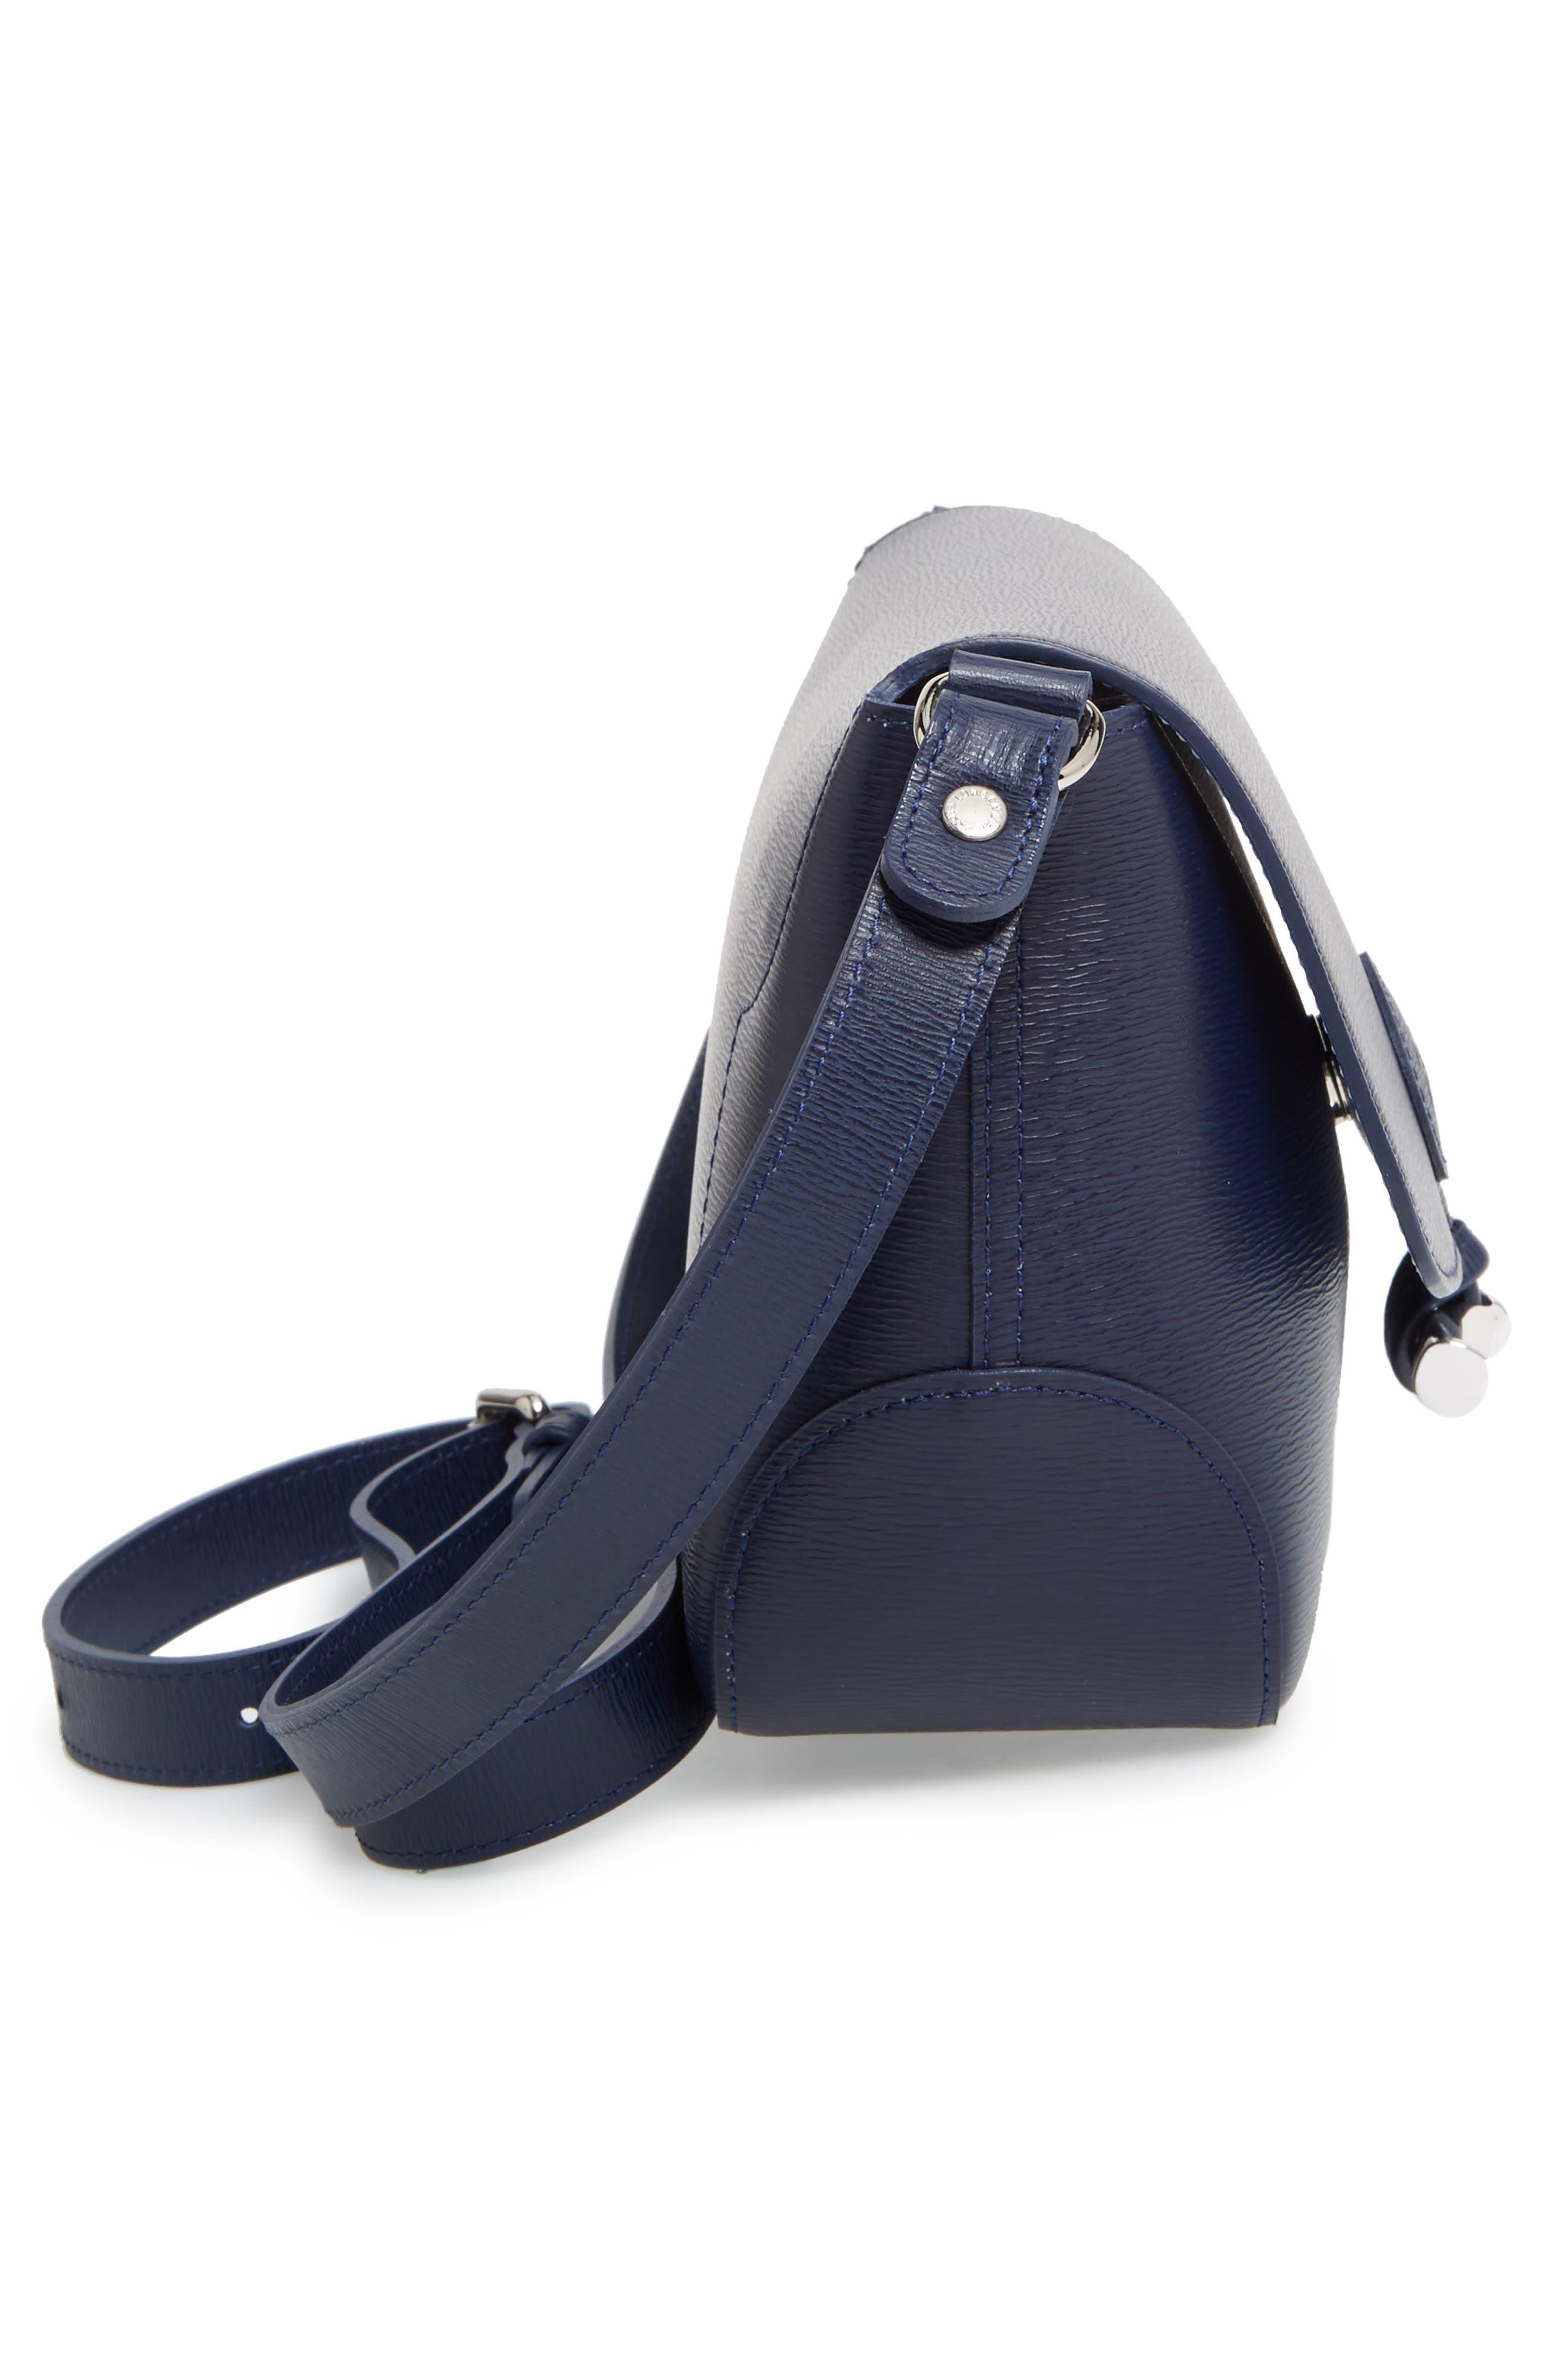 Roseau Leather Crossbody Bag,                             Alternate thumbnail 5, color,                             Navy